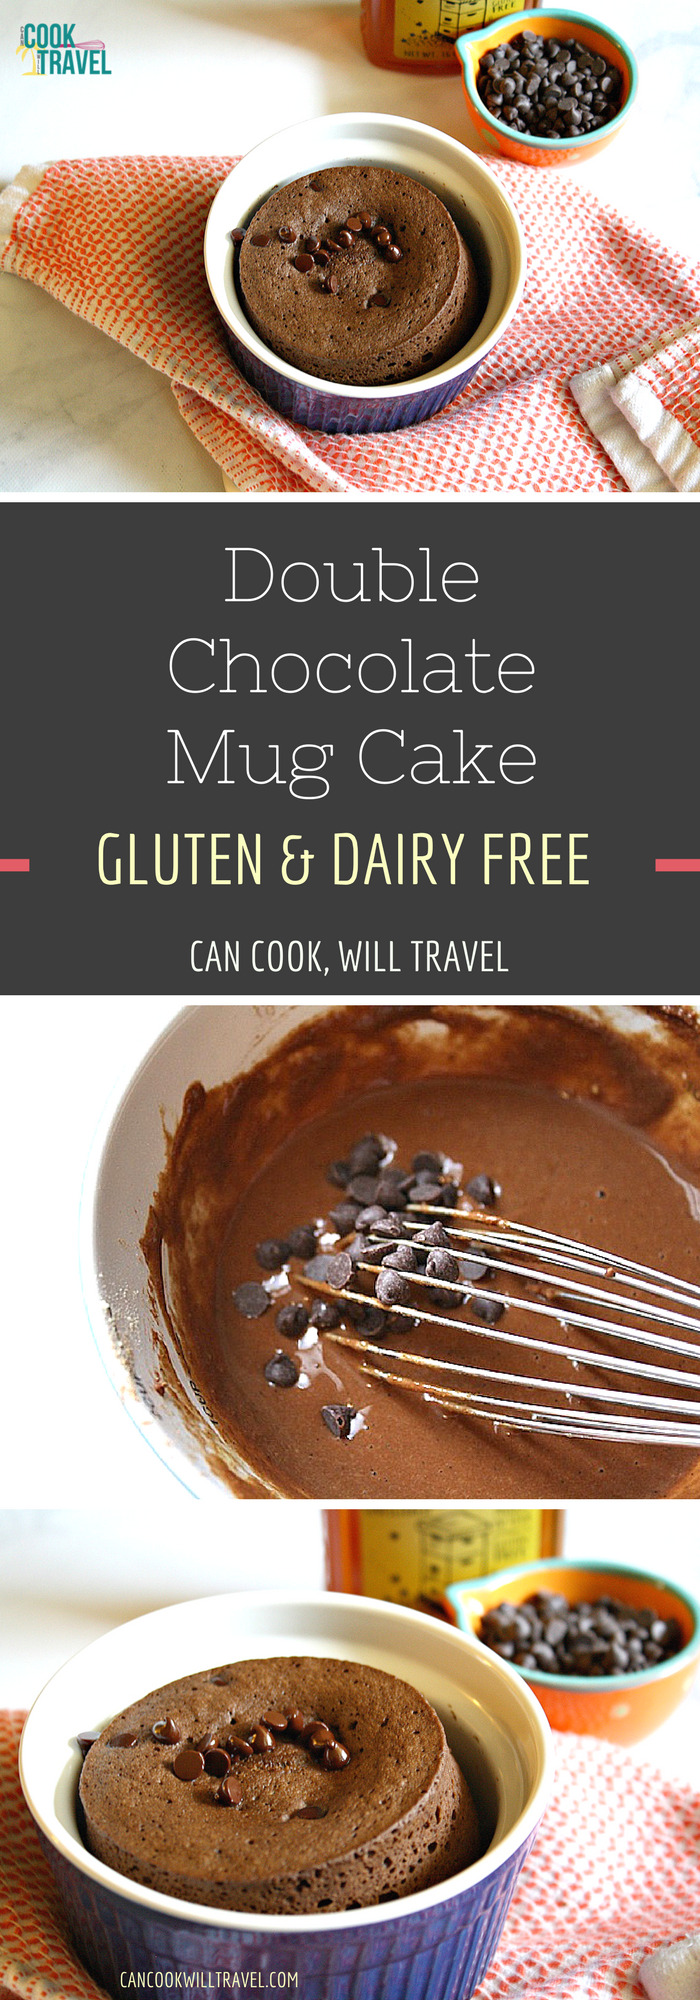 Double Chocolate Mug Cake_Collage2